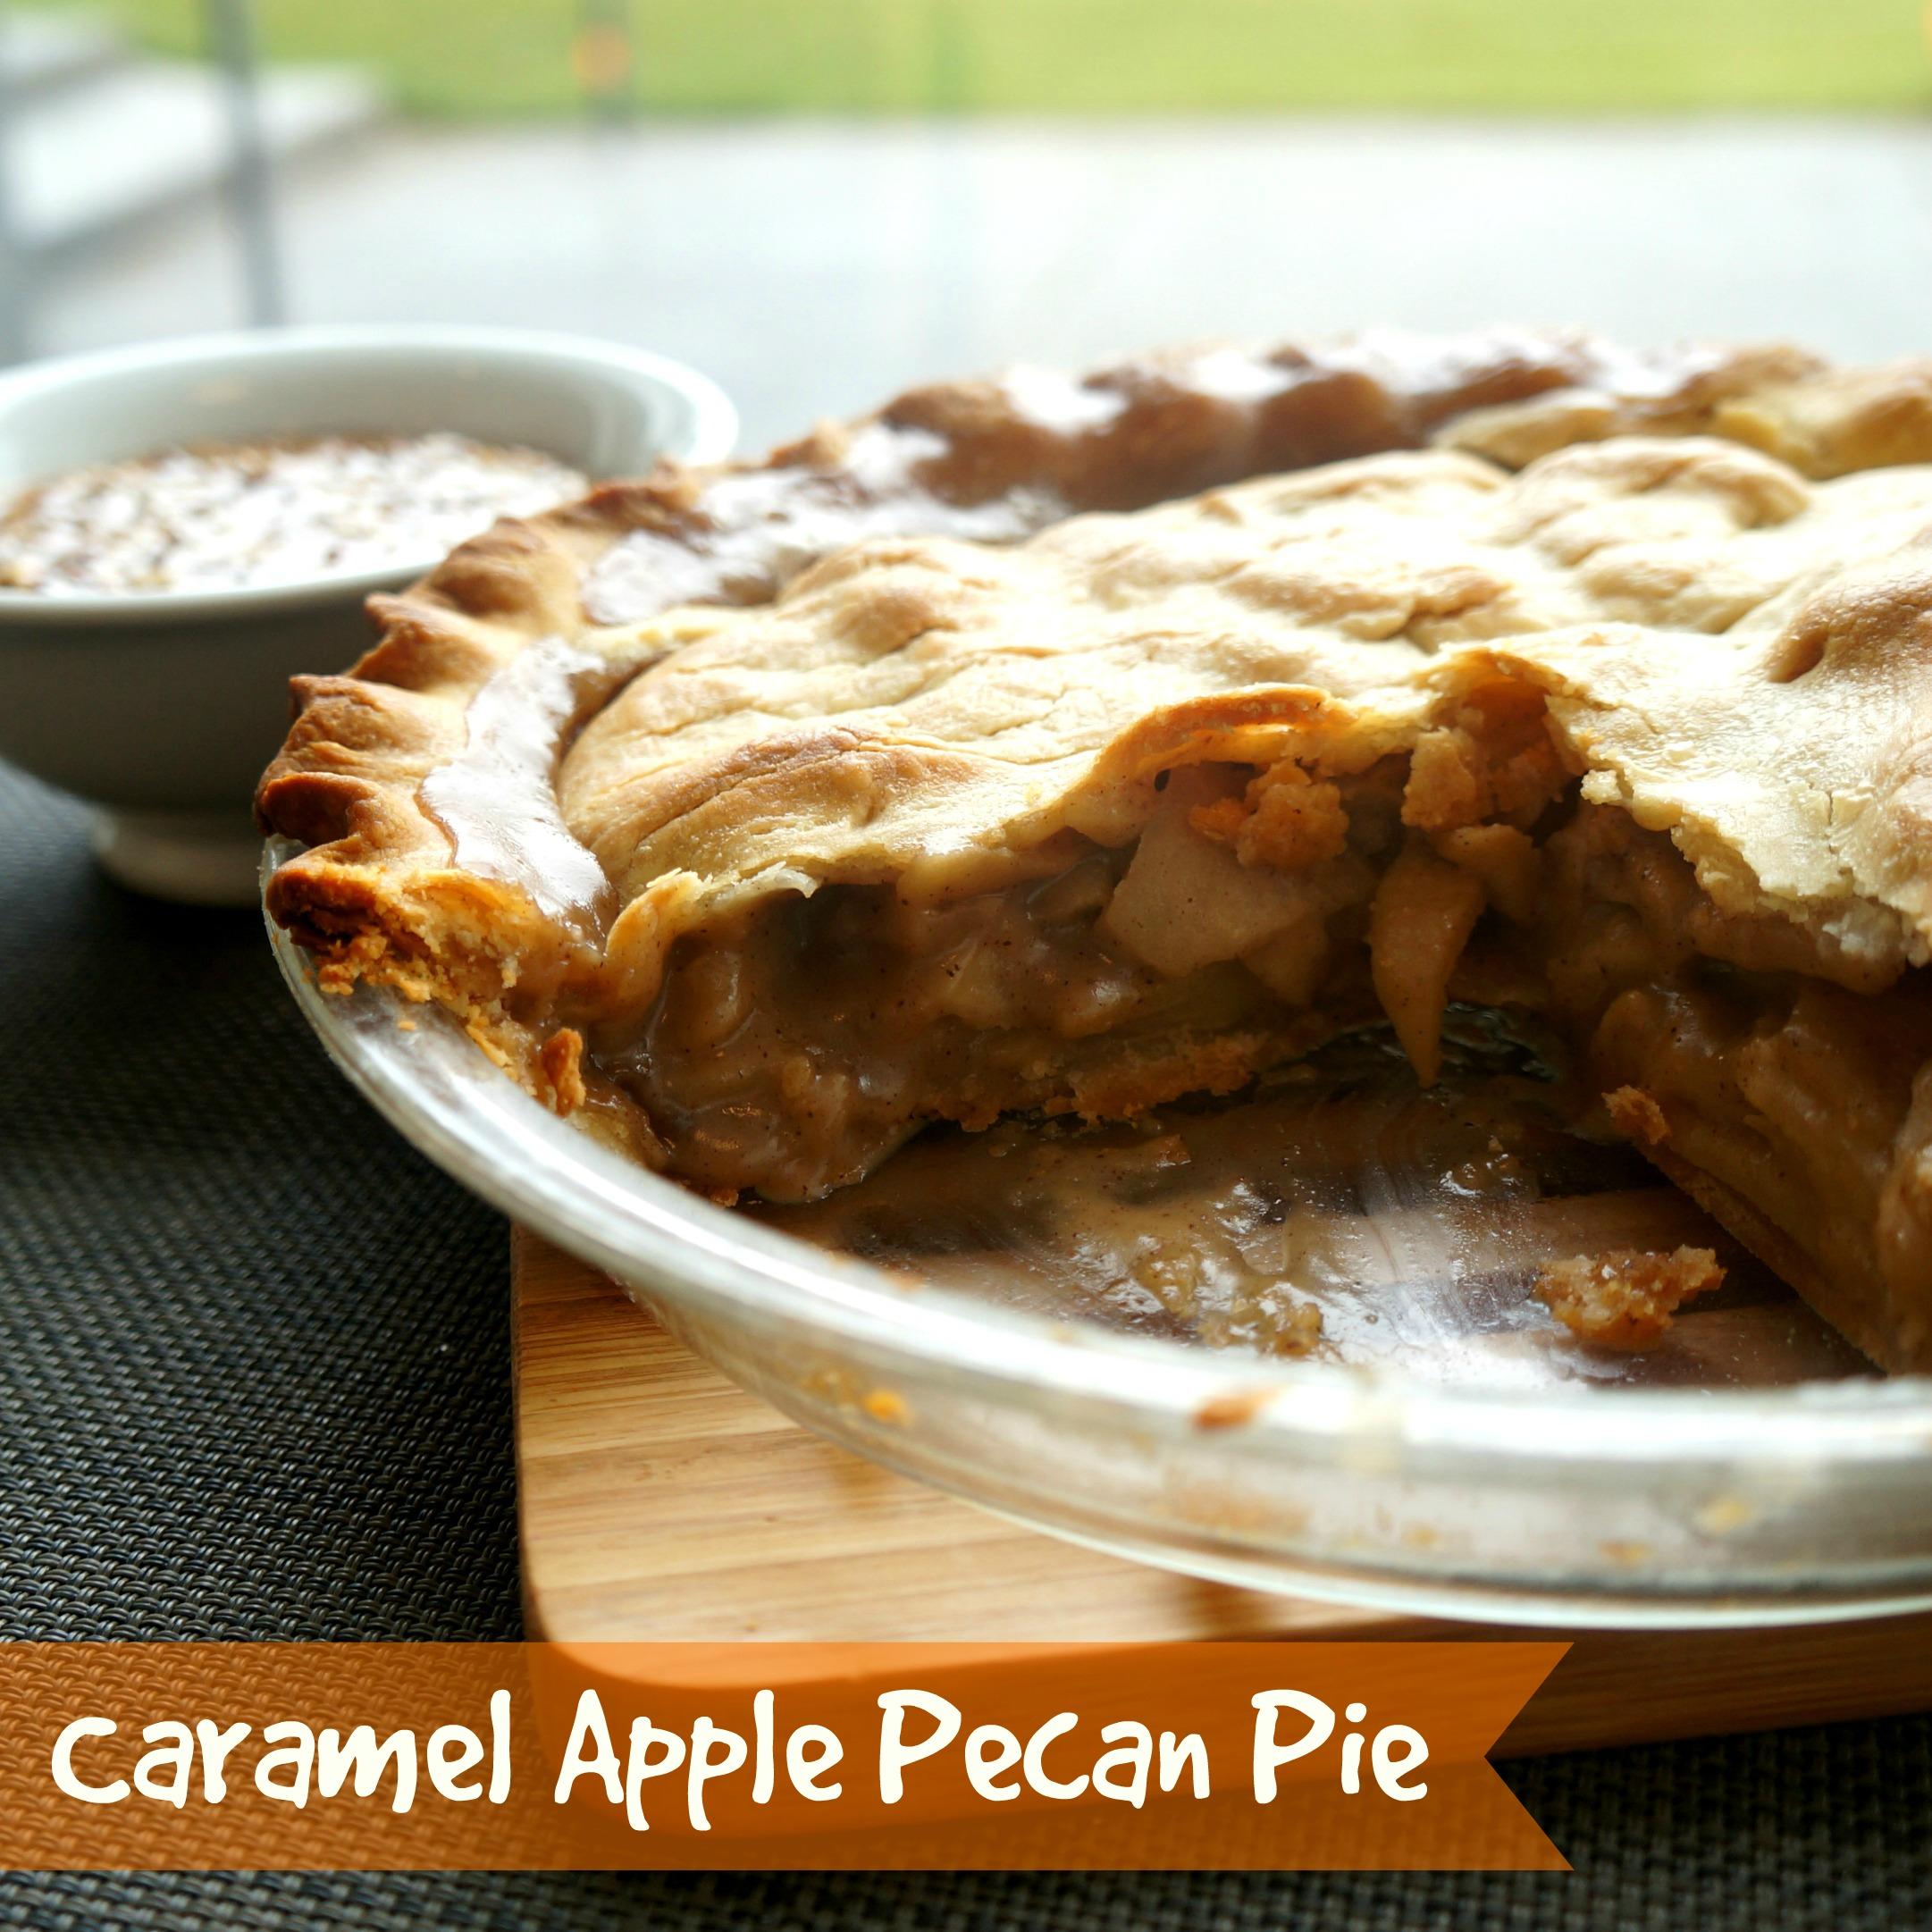 Caramel Apple Pecan Pie | Goodies & Yum x Immaculate Baking